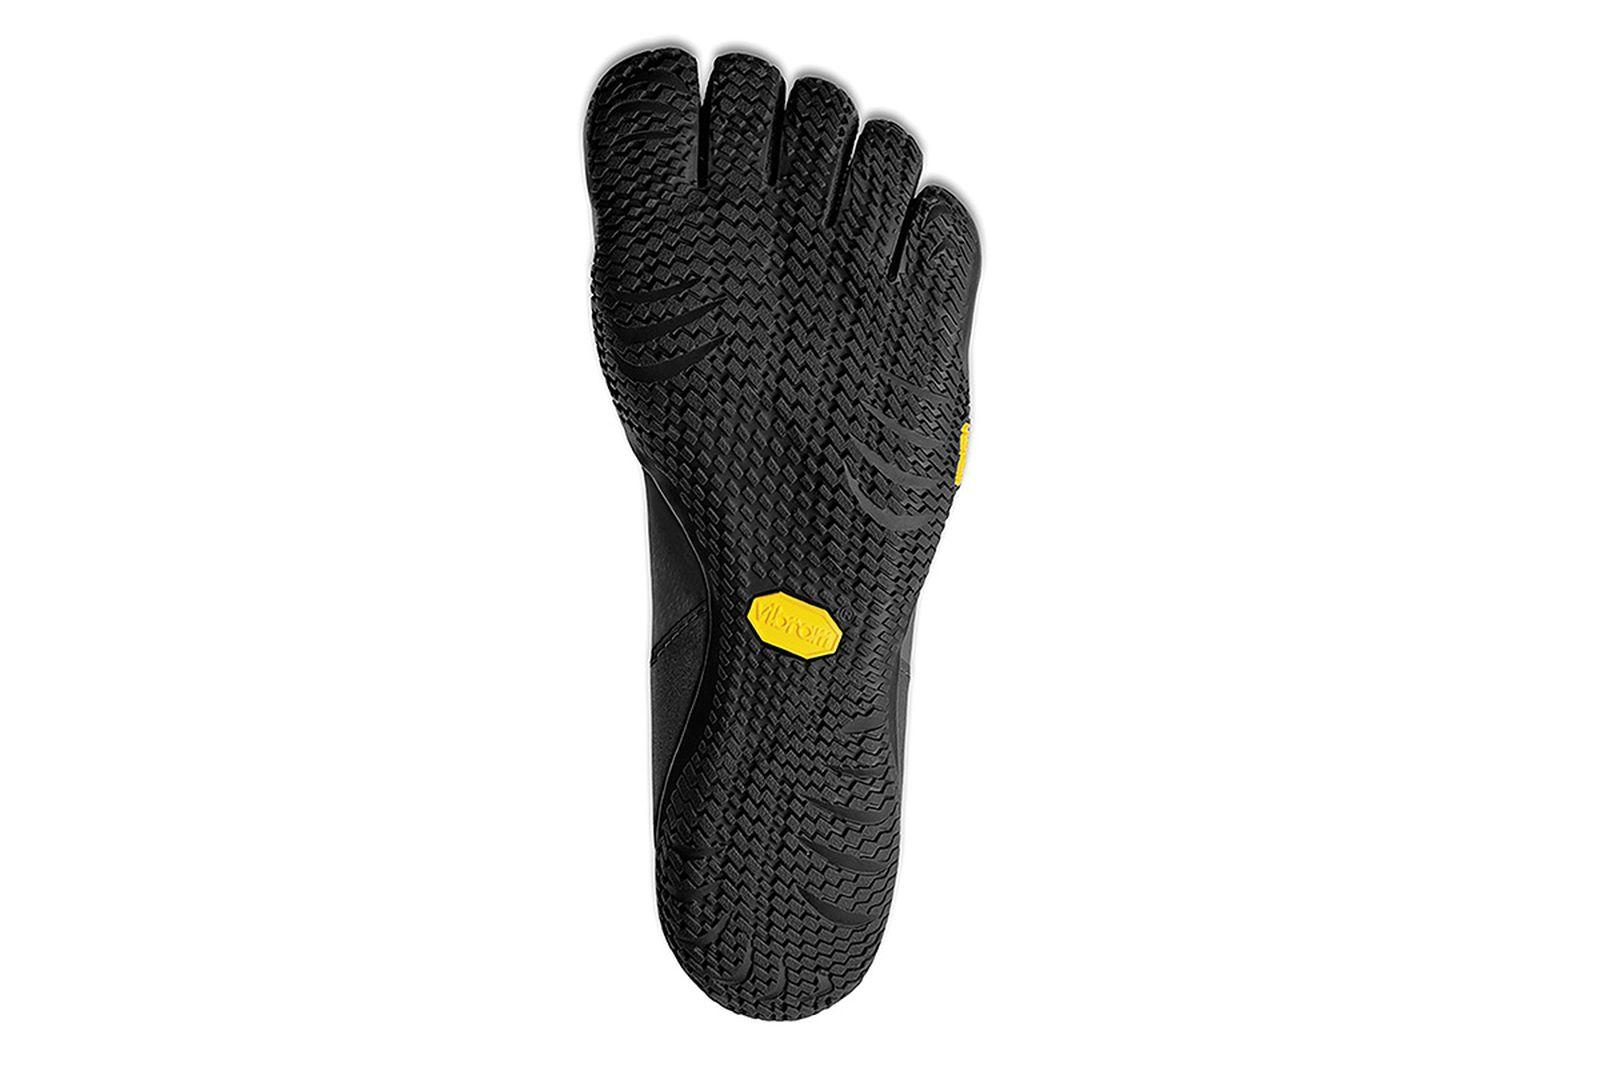 great-cushioning-foot-race-vibram-five-fingers-01